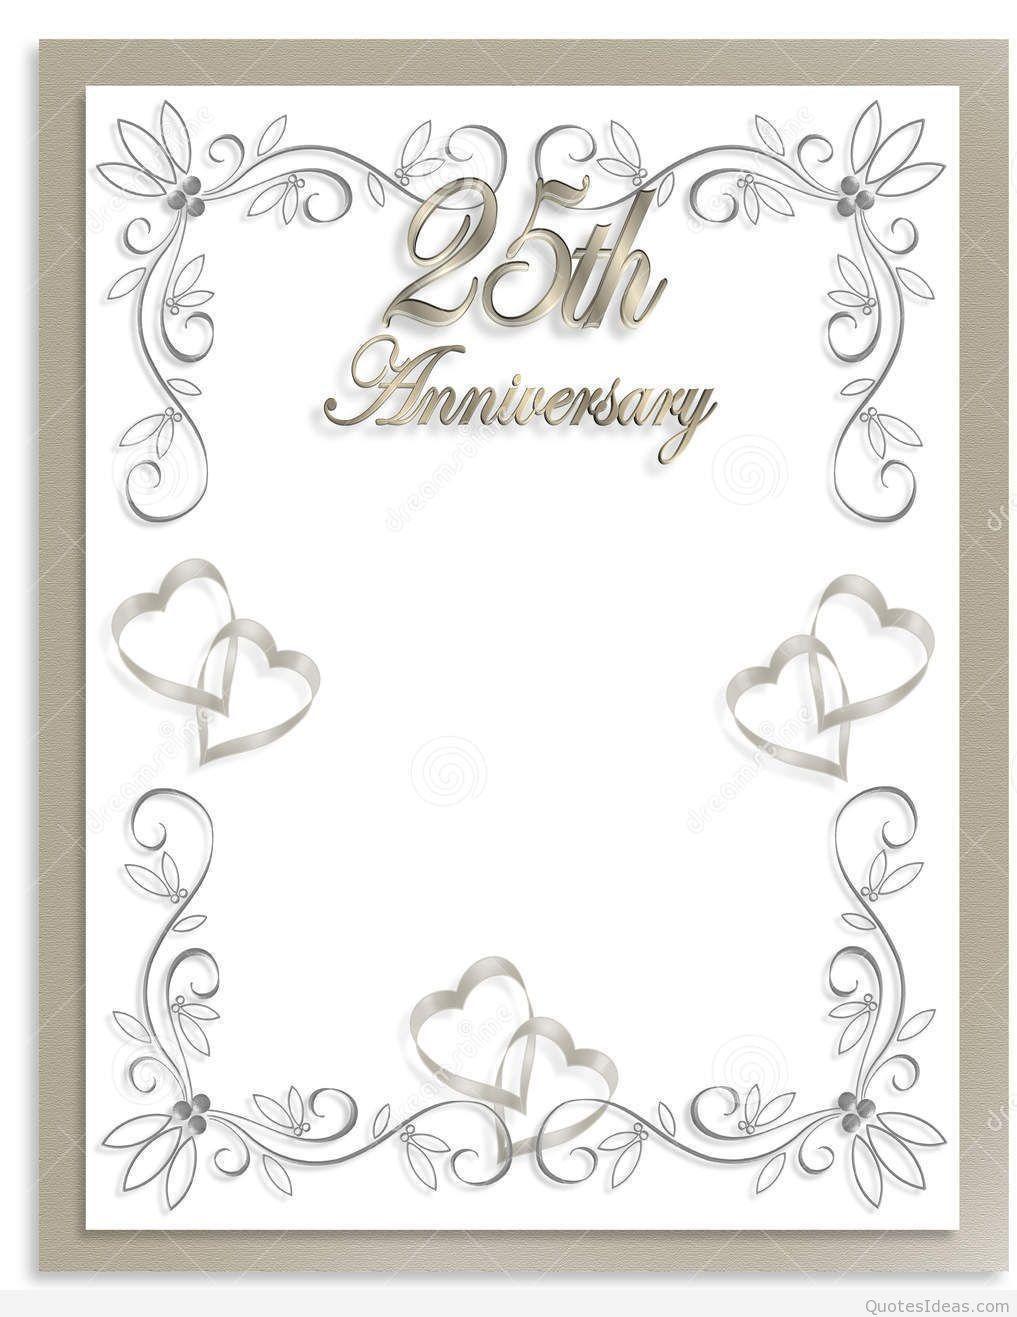 Free Silver Wedding Anniversary Invitations Templates Throughou Silver Wedding Invitations Wedding Anniversary Invitations 25th Wedding Anniversary Invitations